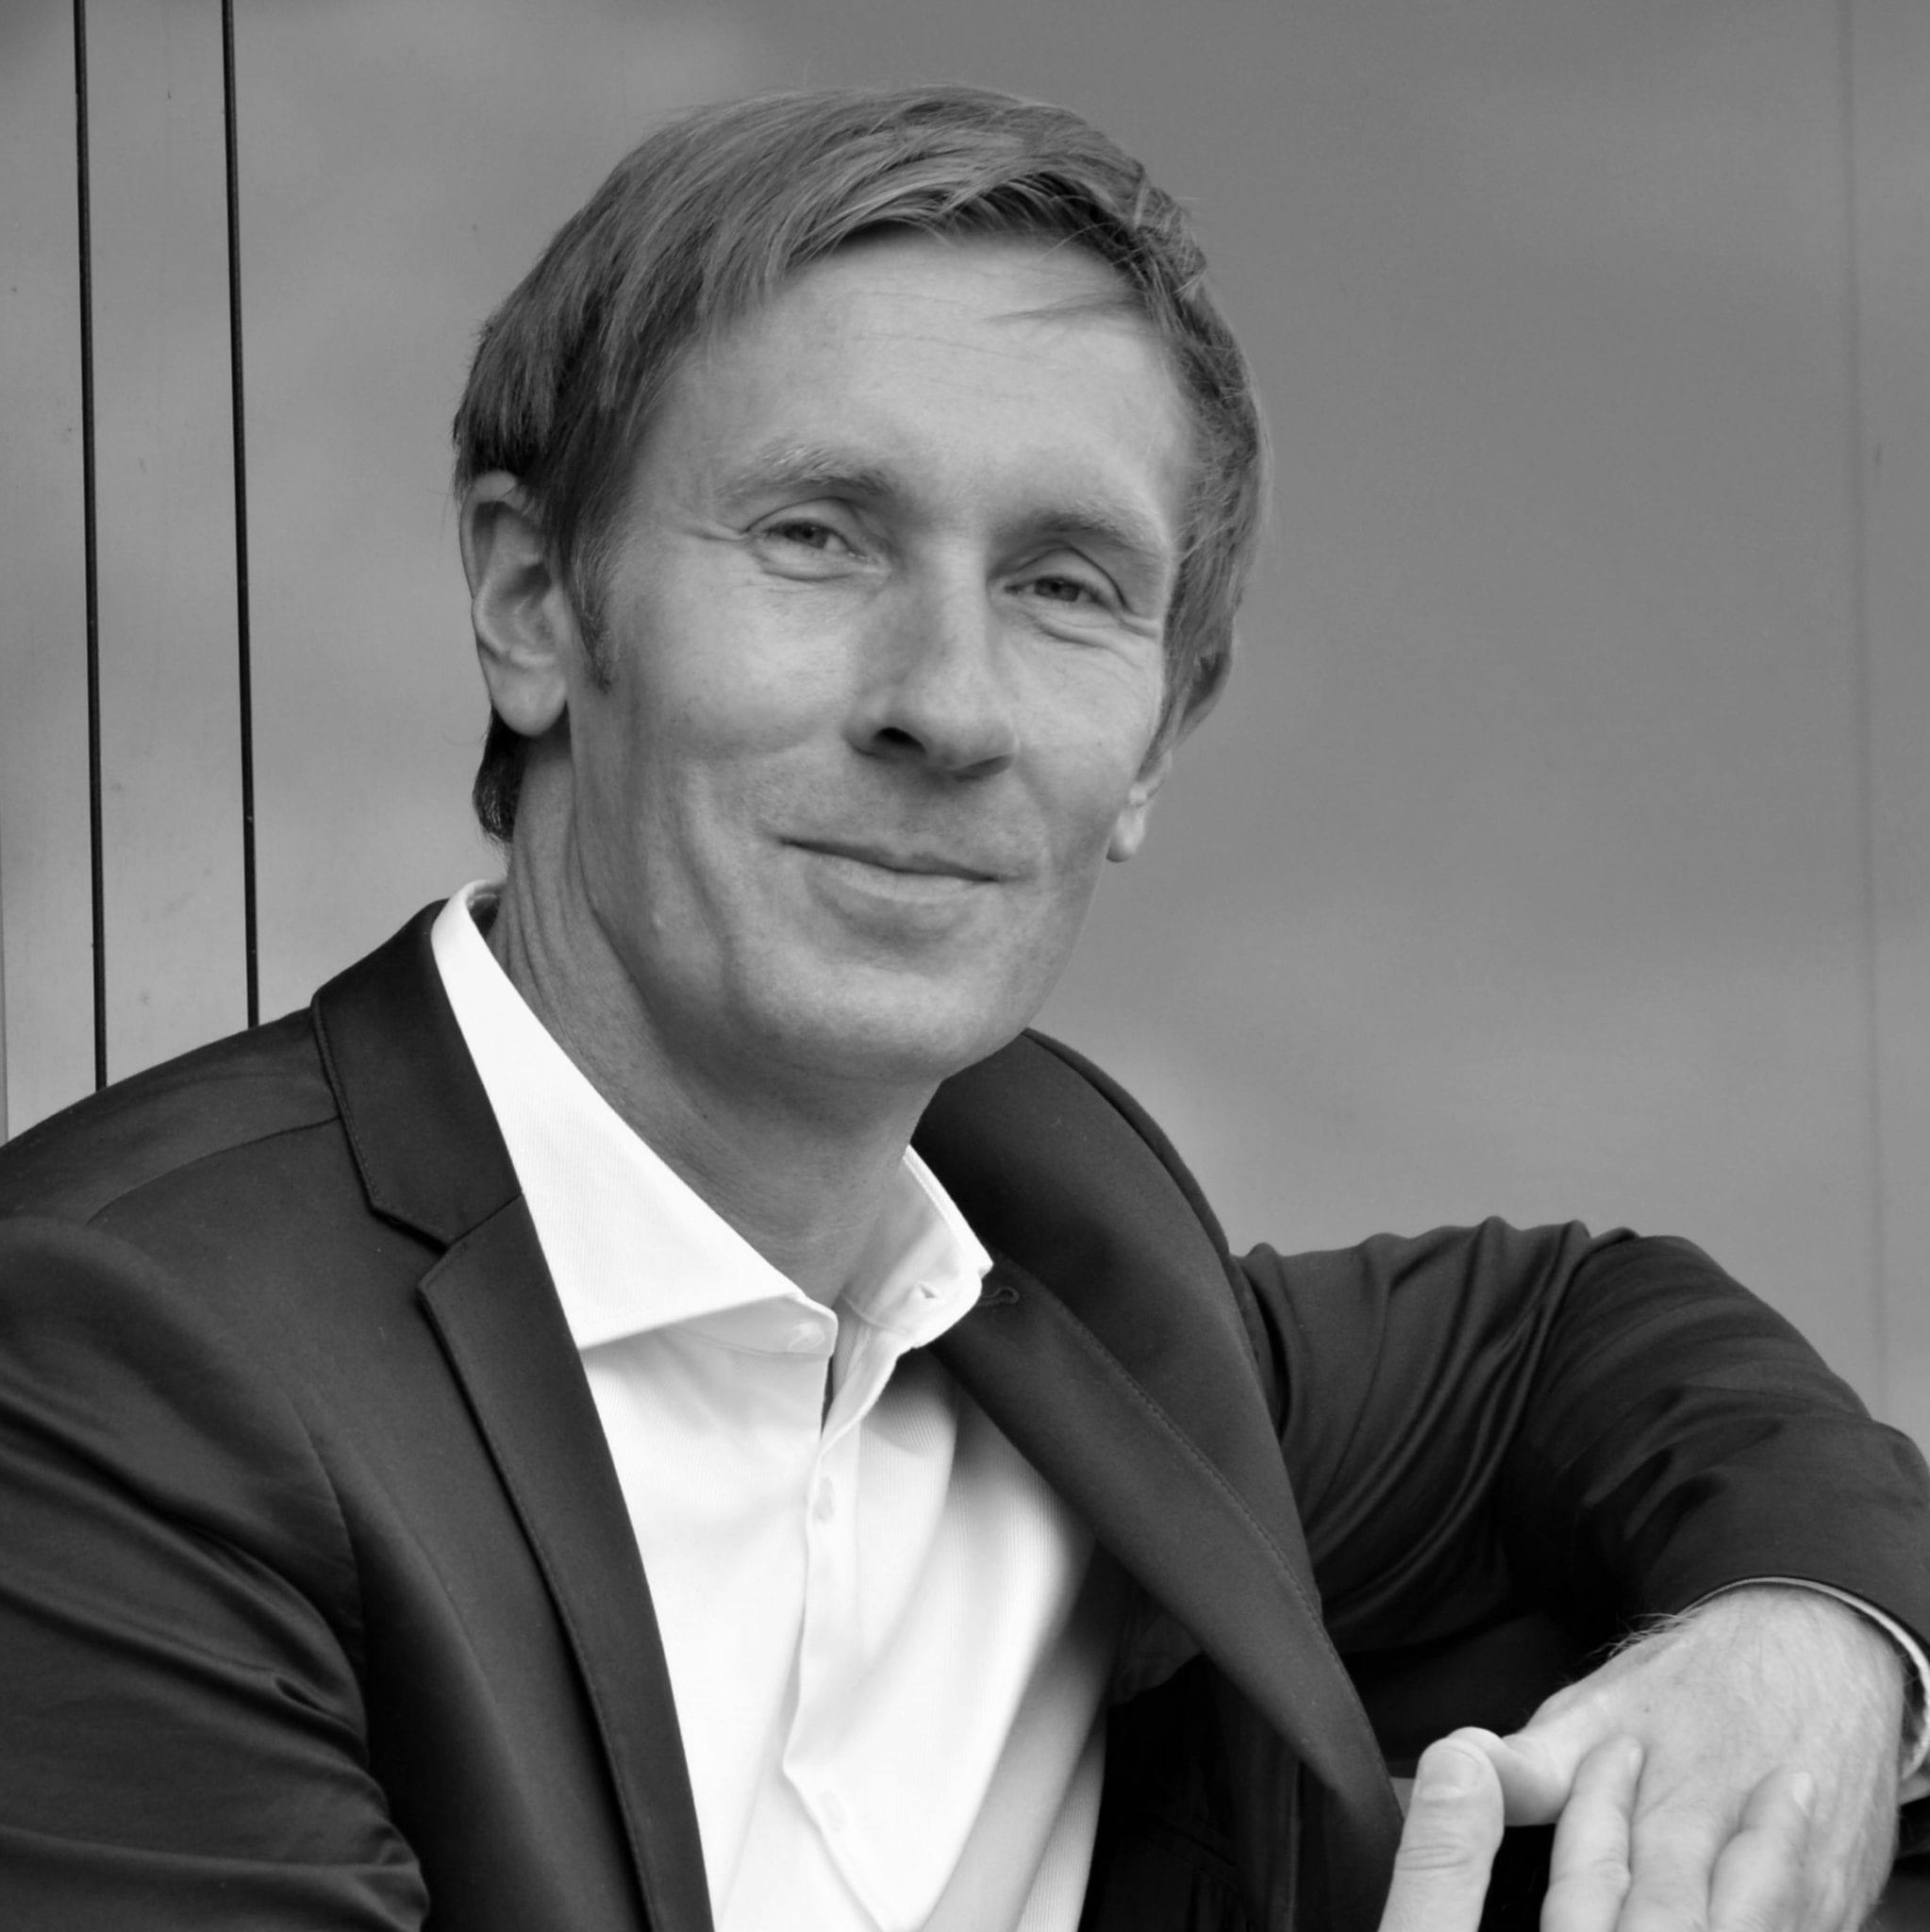 Dr. Christian Müller-Espey